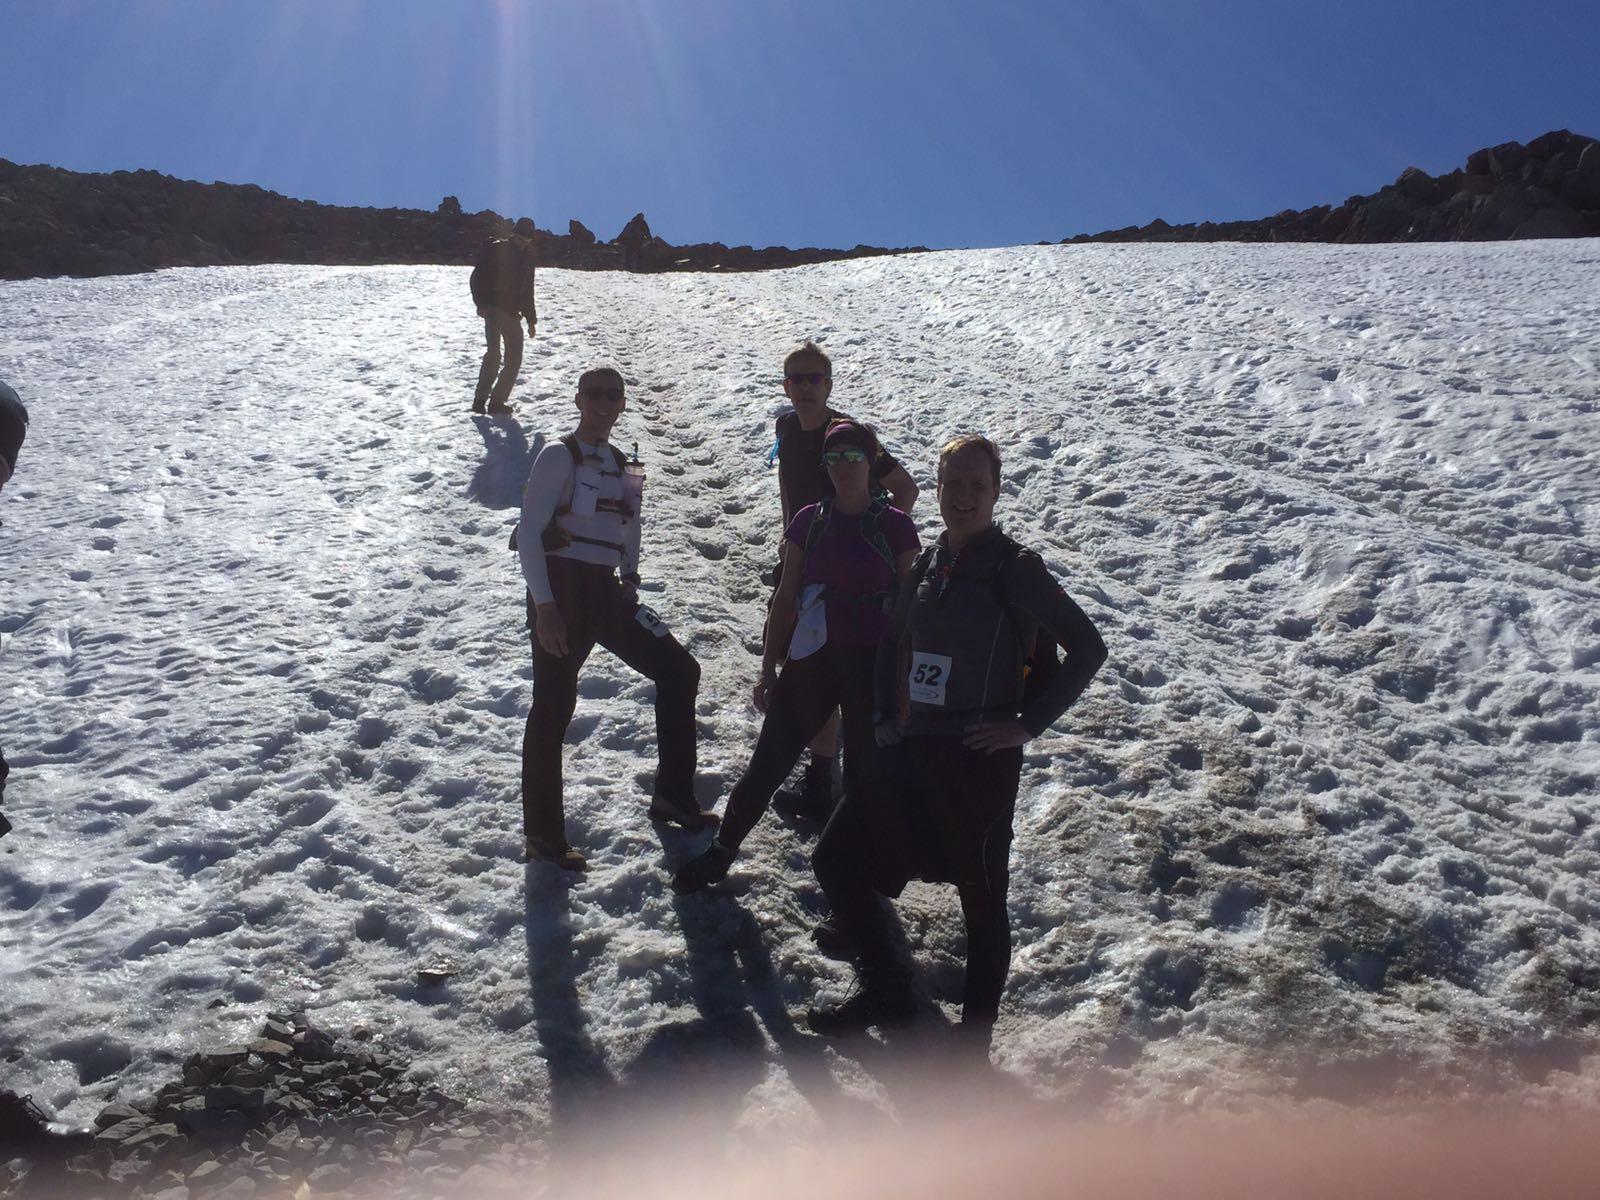 Meeting A Mountainous Challenge